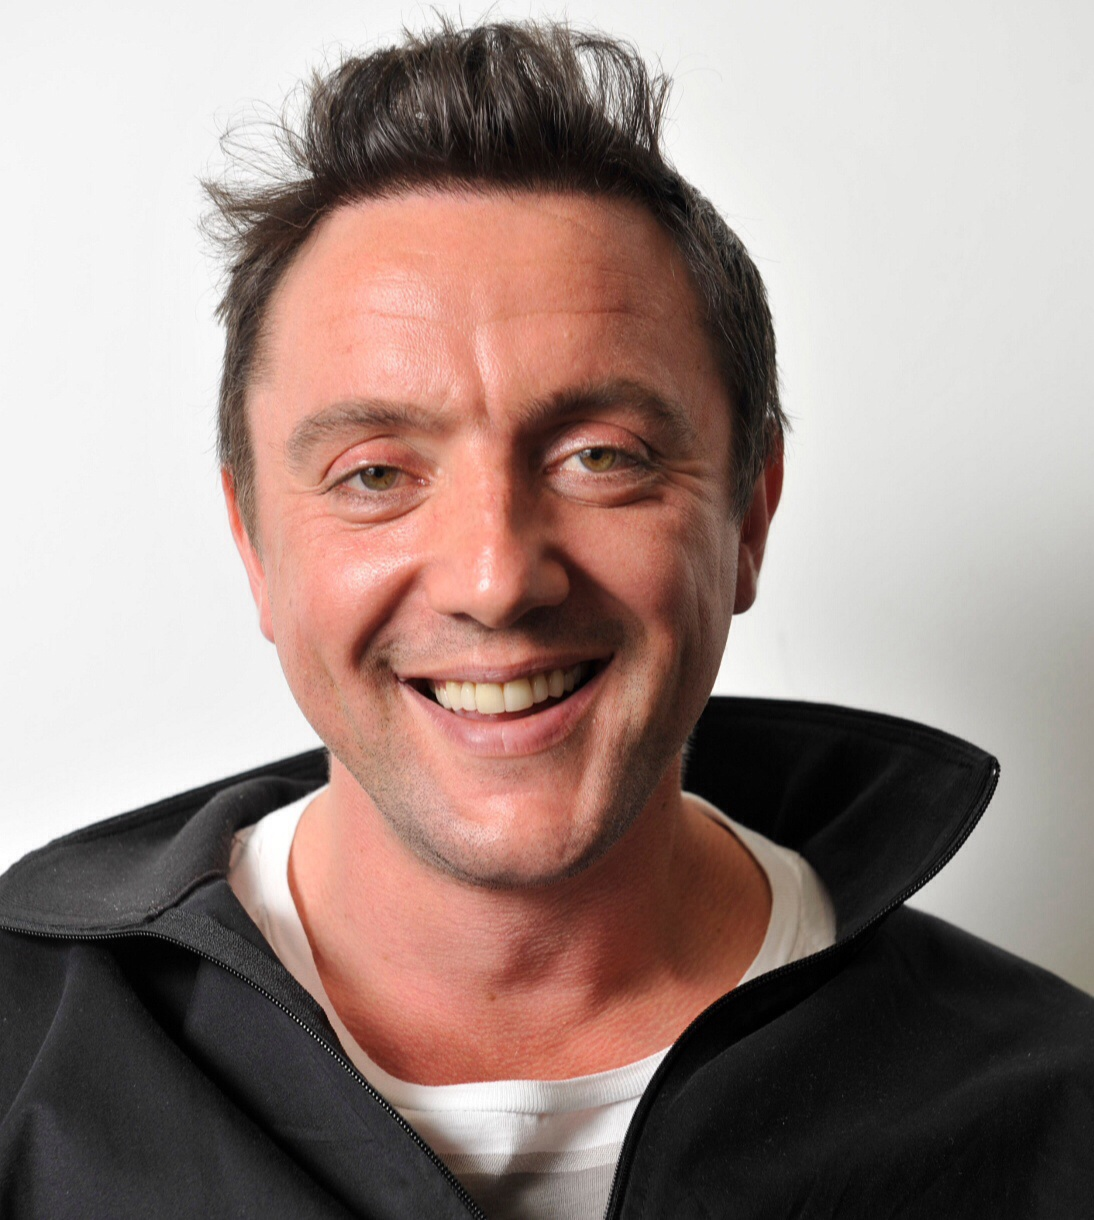 Peter Serafinowicz (born 1972)